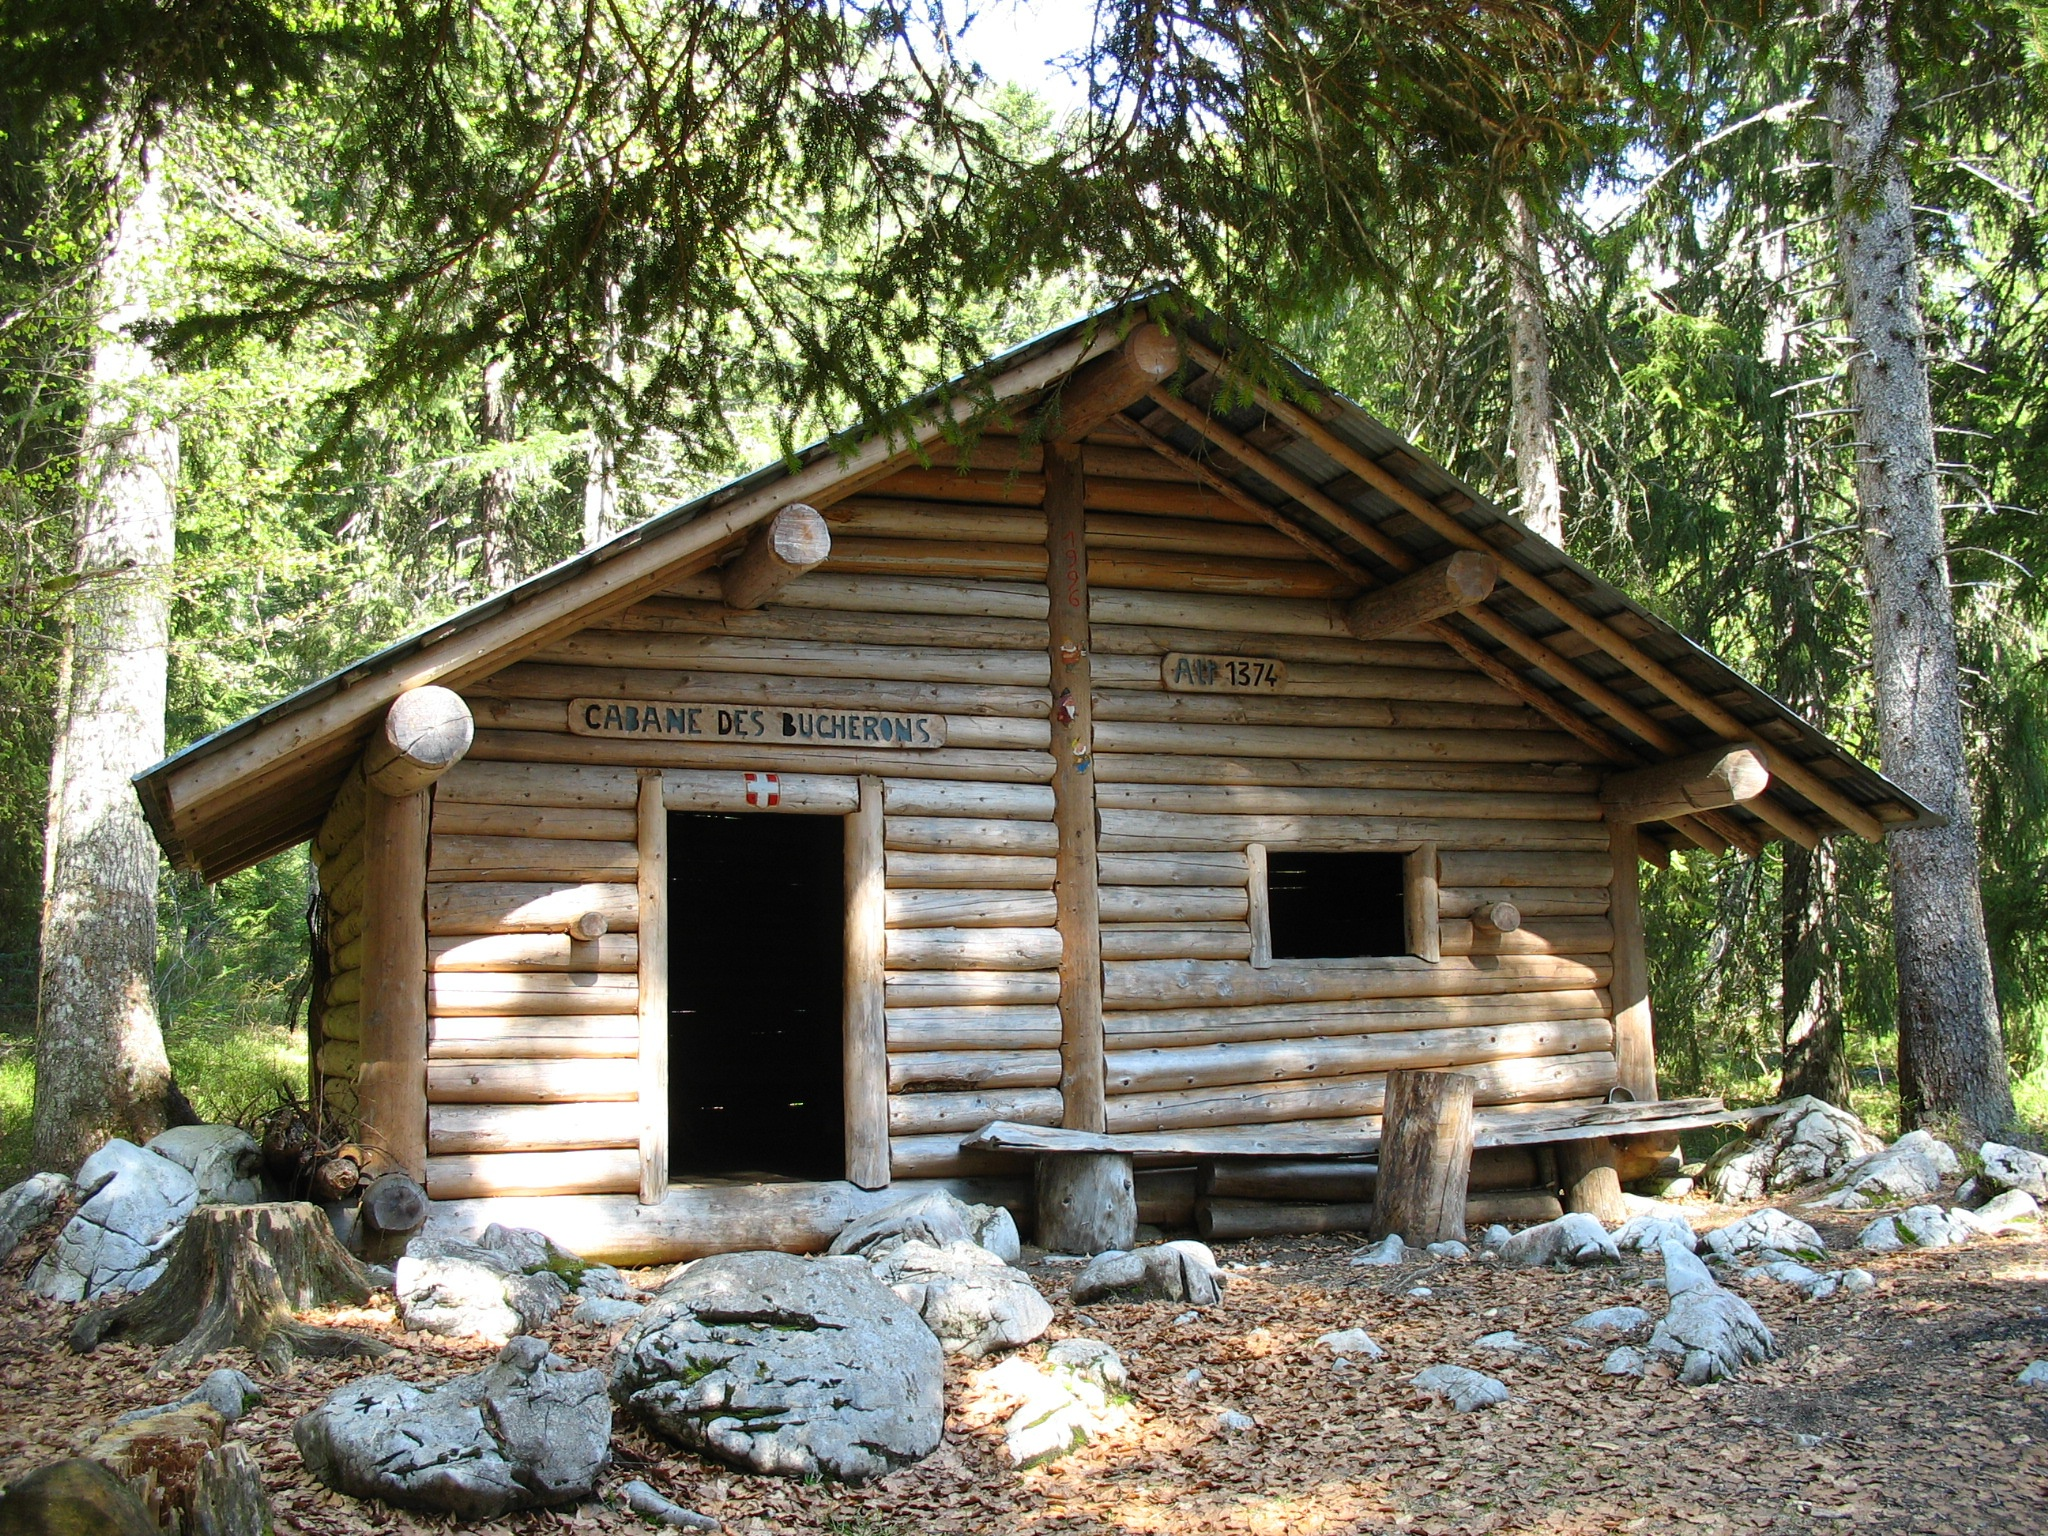 cabane des b cherons 1374 m cabane non gard e. Black Bedroom Furniture Sets. Home Design Ideas